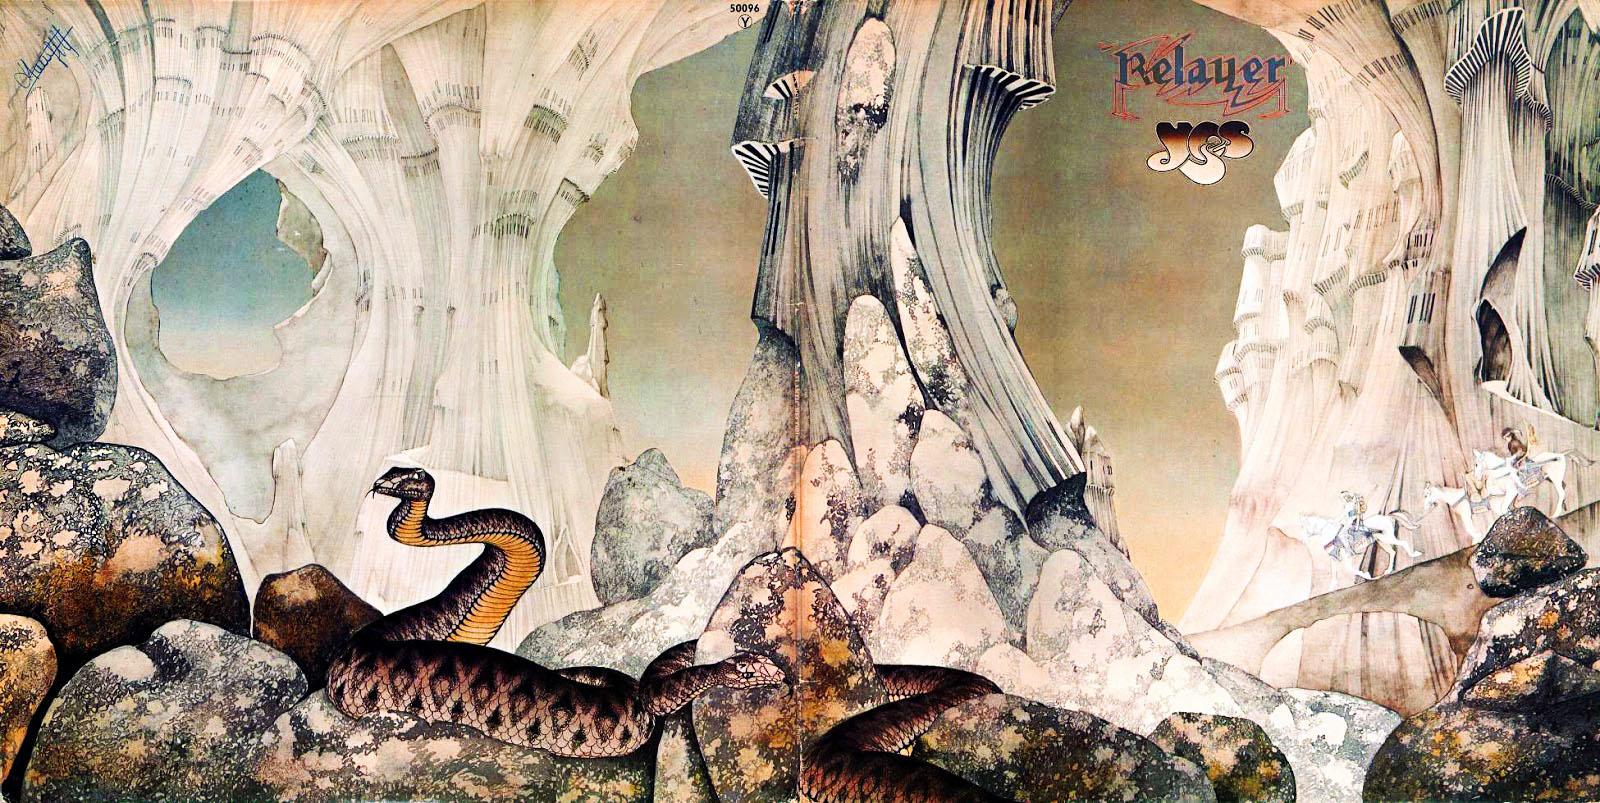 Top 10 Roger Dean Album Covers Octopus Cartoon Images